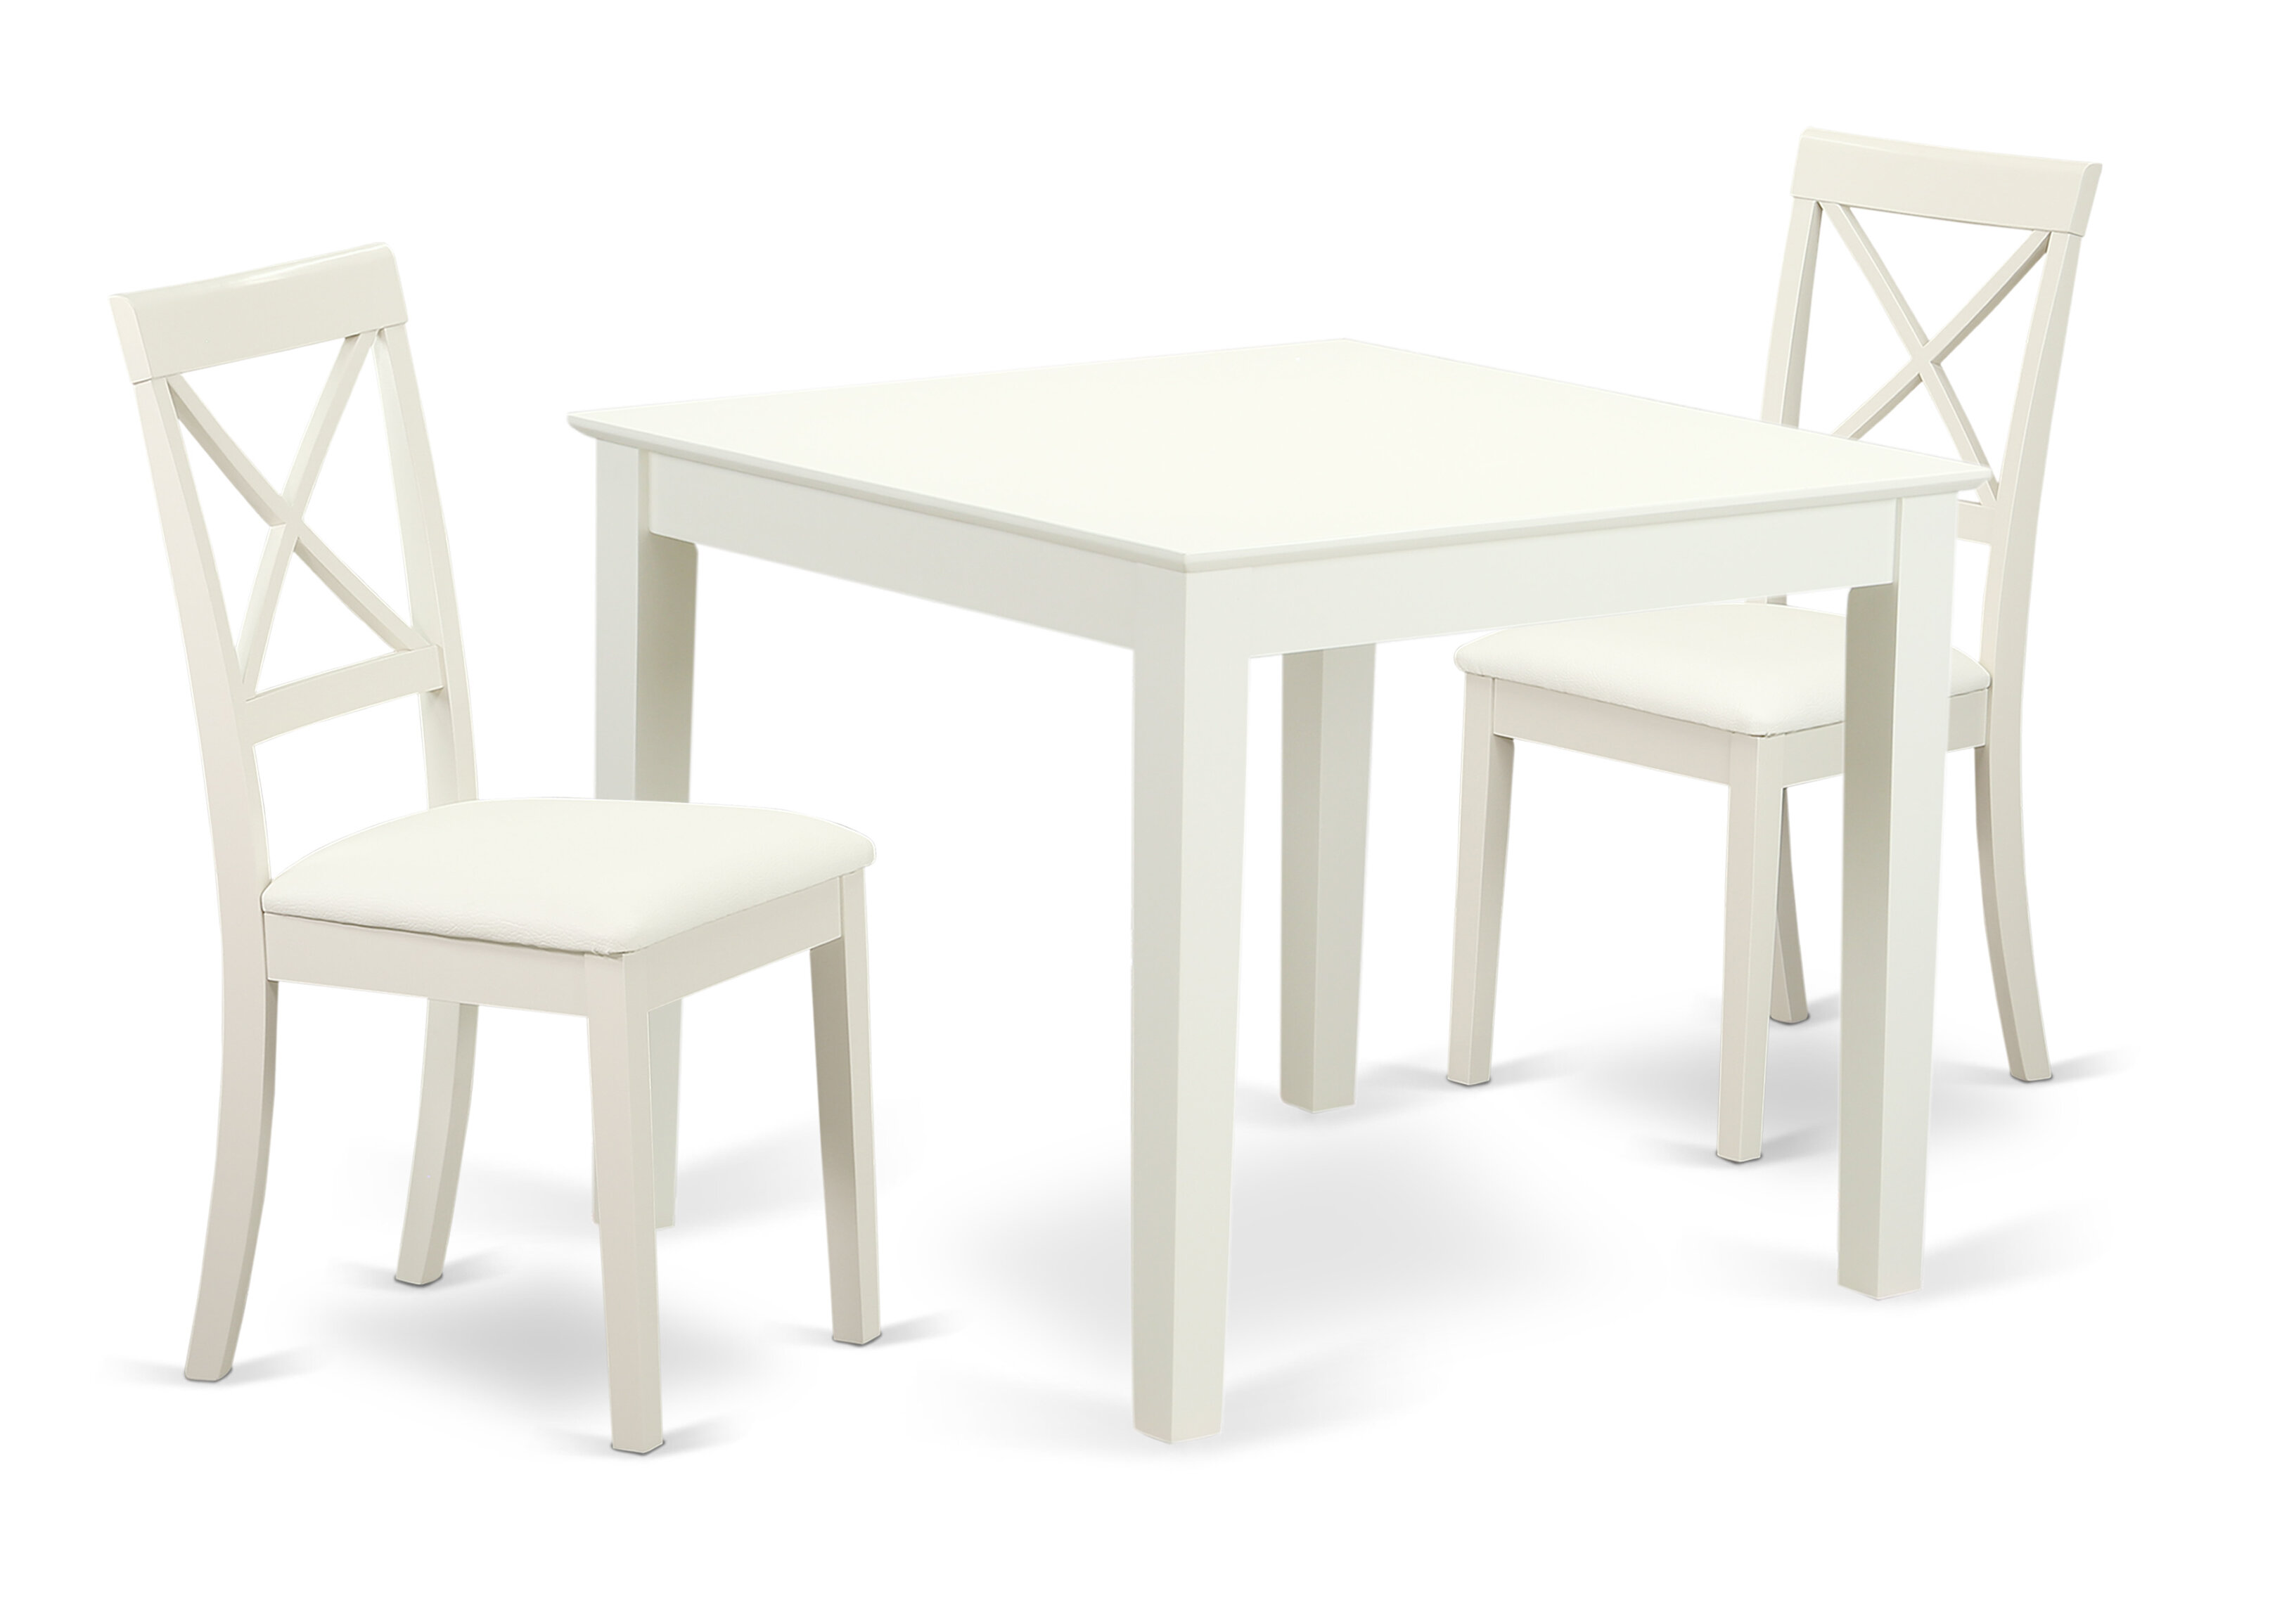 Alcott Hill Cobleskill Rubberwood Solid Wood Dining Set Reviews Wayfair